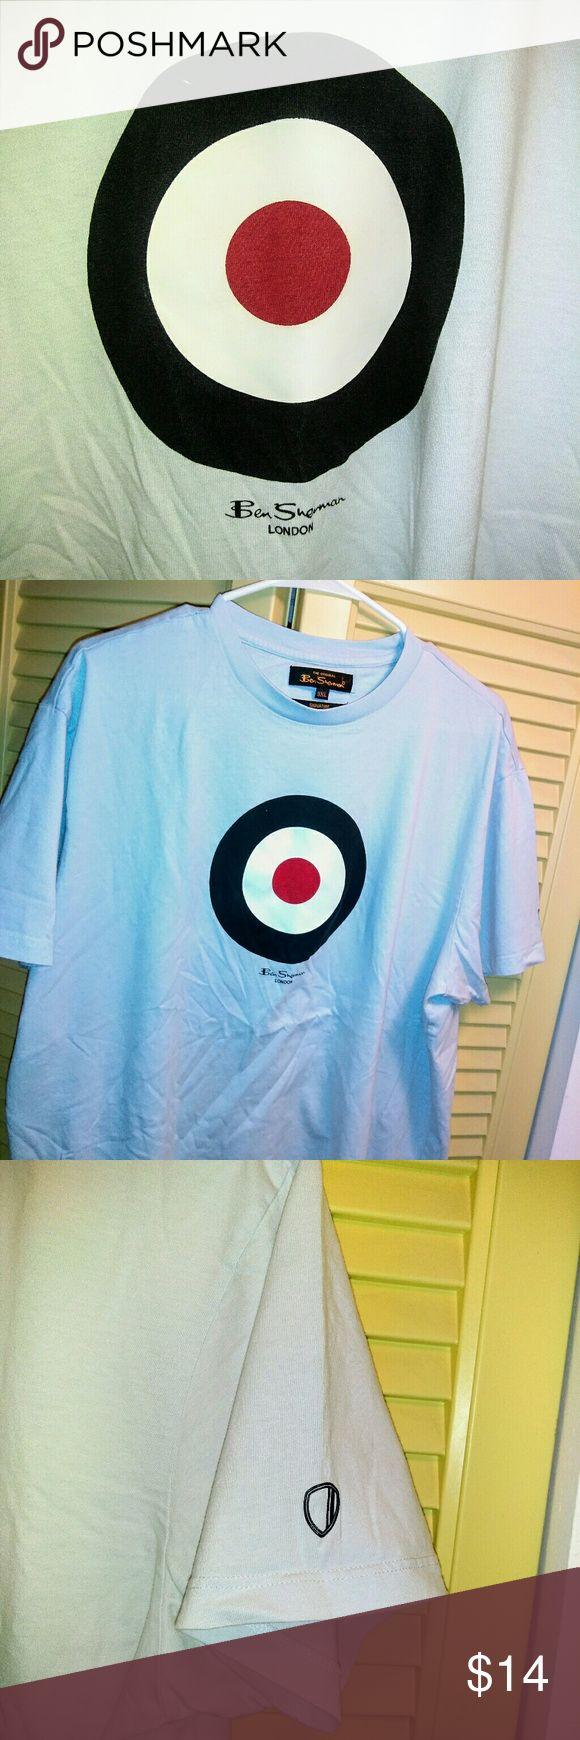 Men's Ben Sherman 3XL shirt 100% cotton light blue shirt with Ben Sherman logo.  Fits more like a 2XL. Ben Sherman Shirts Tees - Short Sleeve